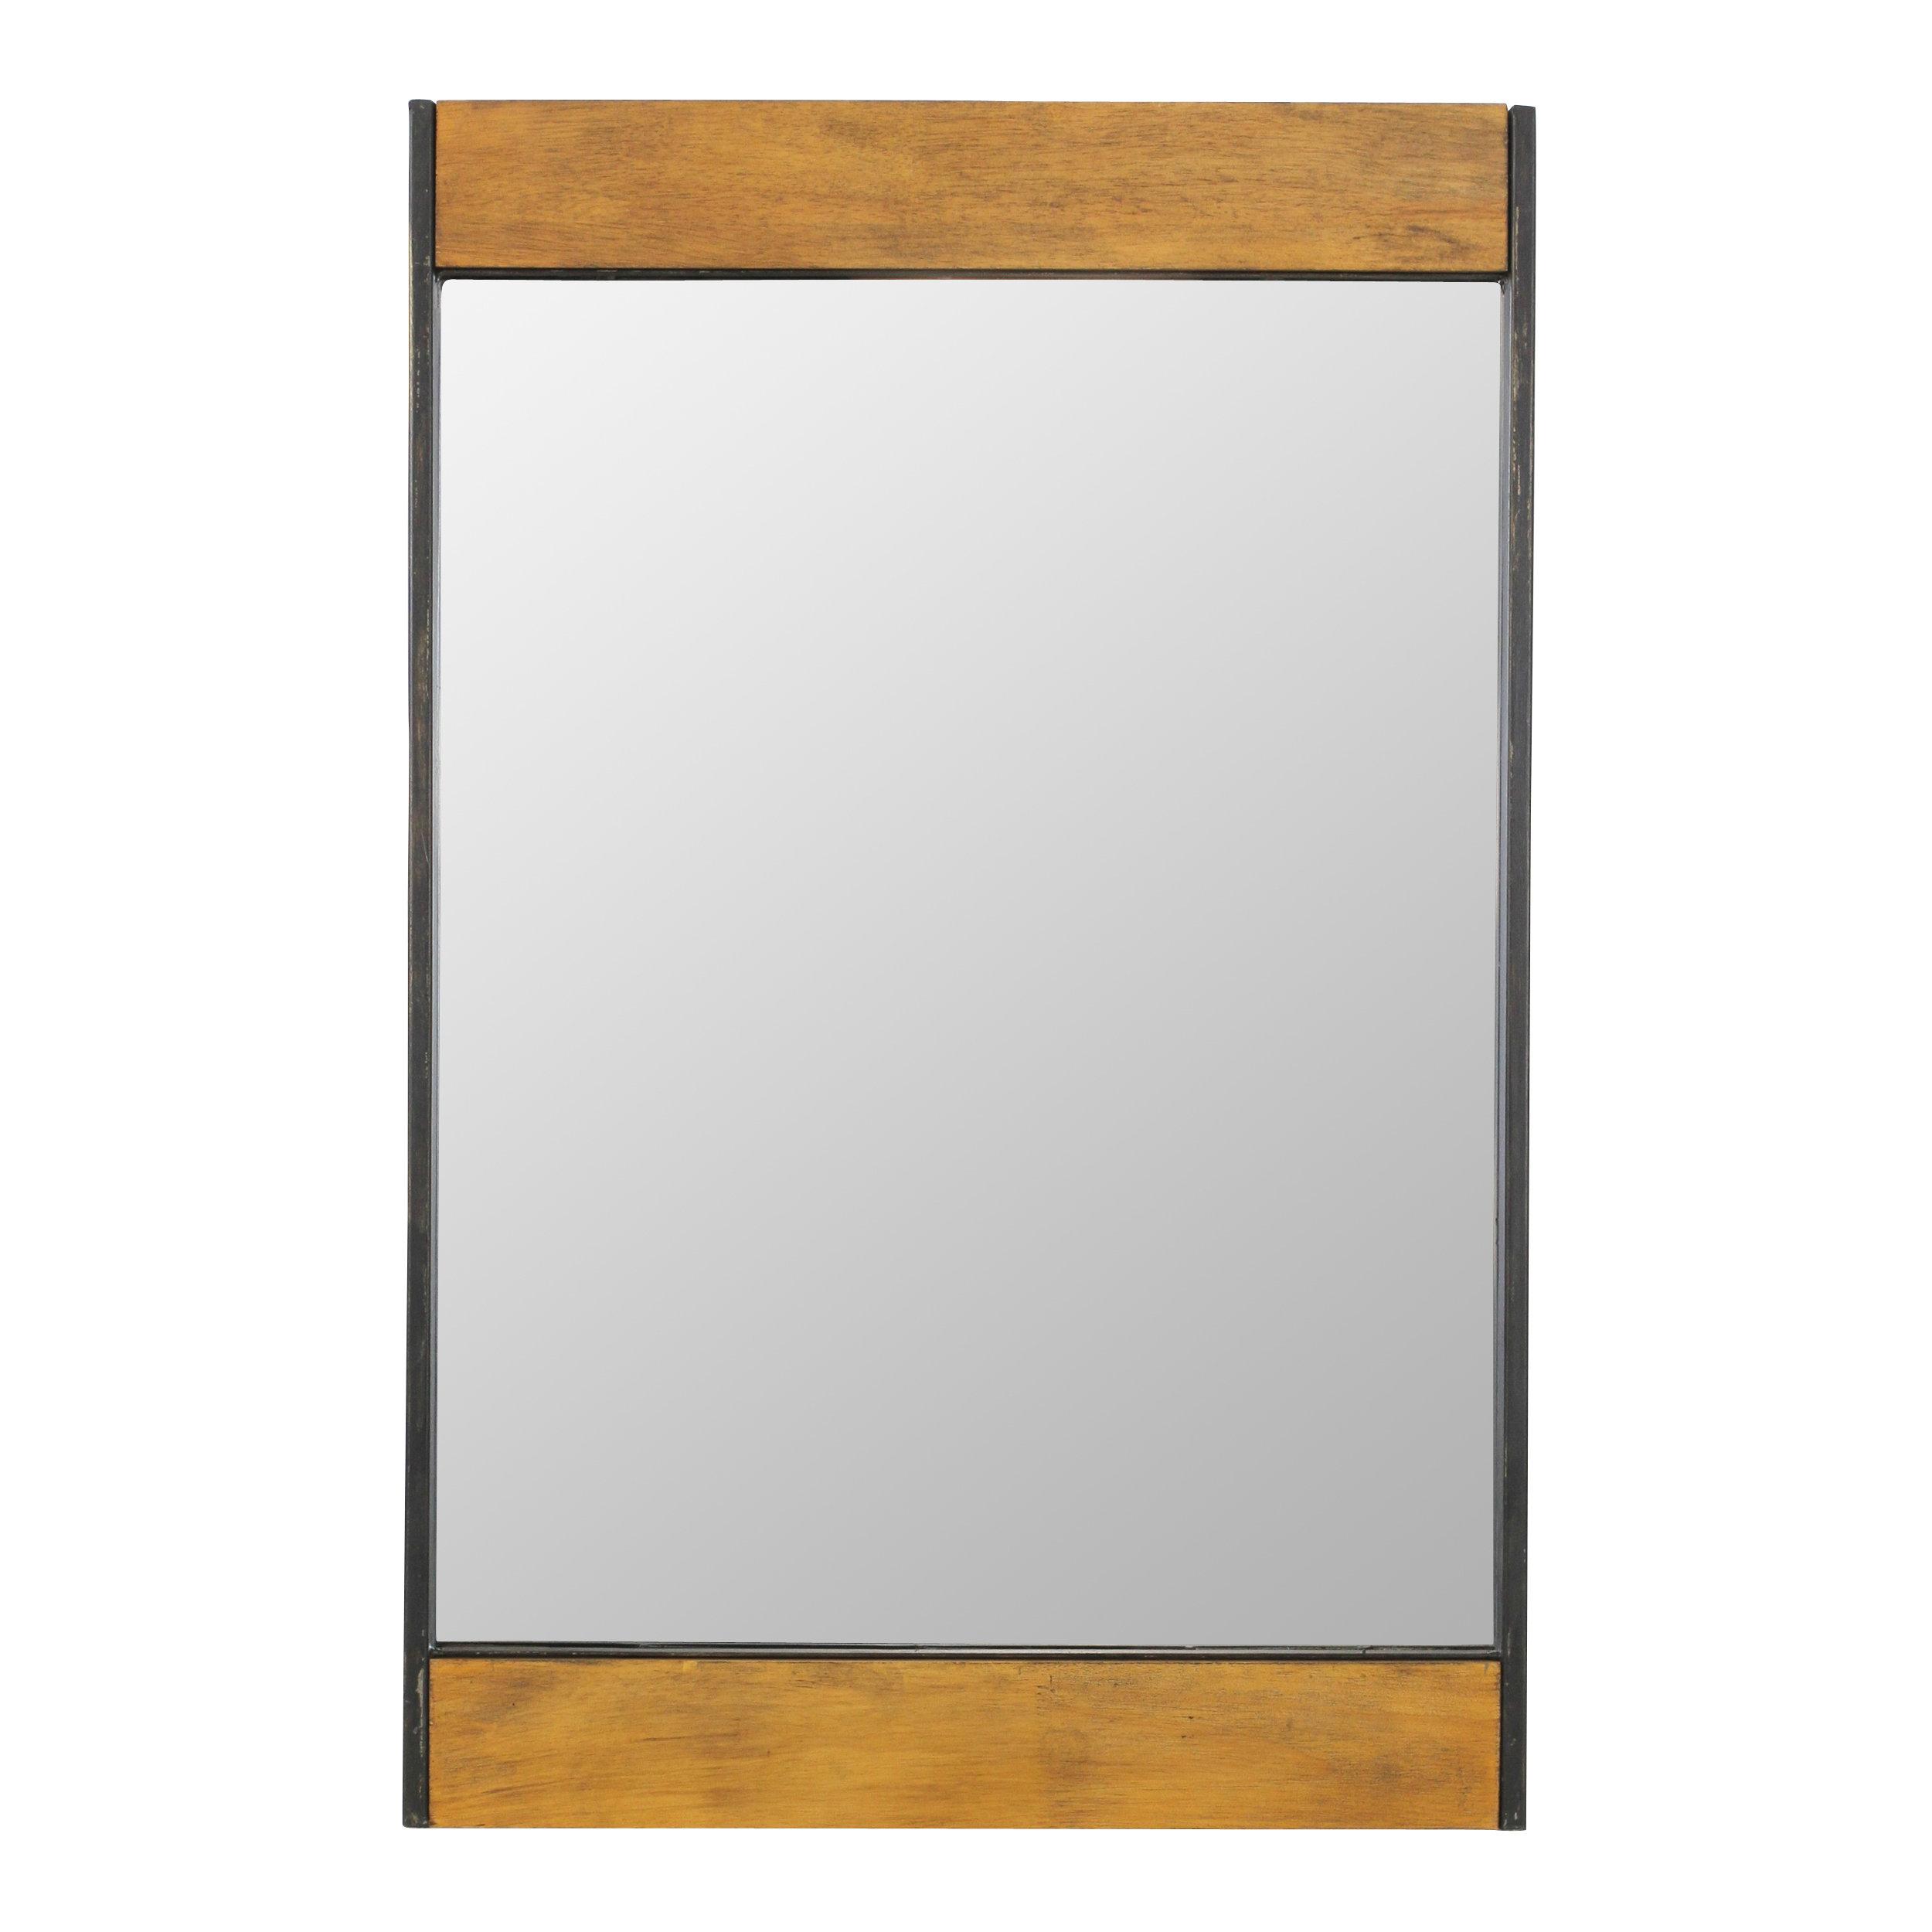 Miranda Wood And Metal Wall Mirror throughout Koeller Industrial Metal Wall Mirrors (Image 19 of 30)